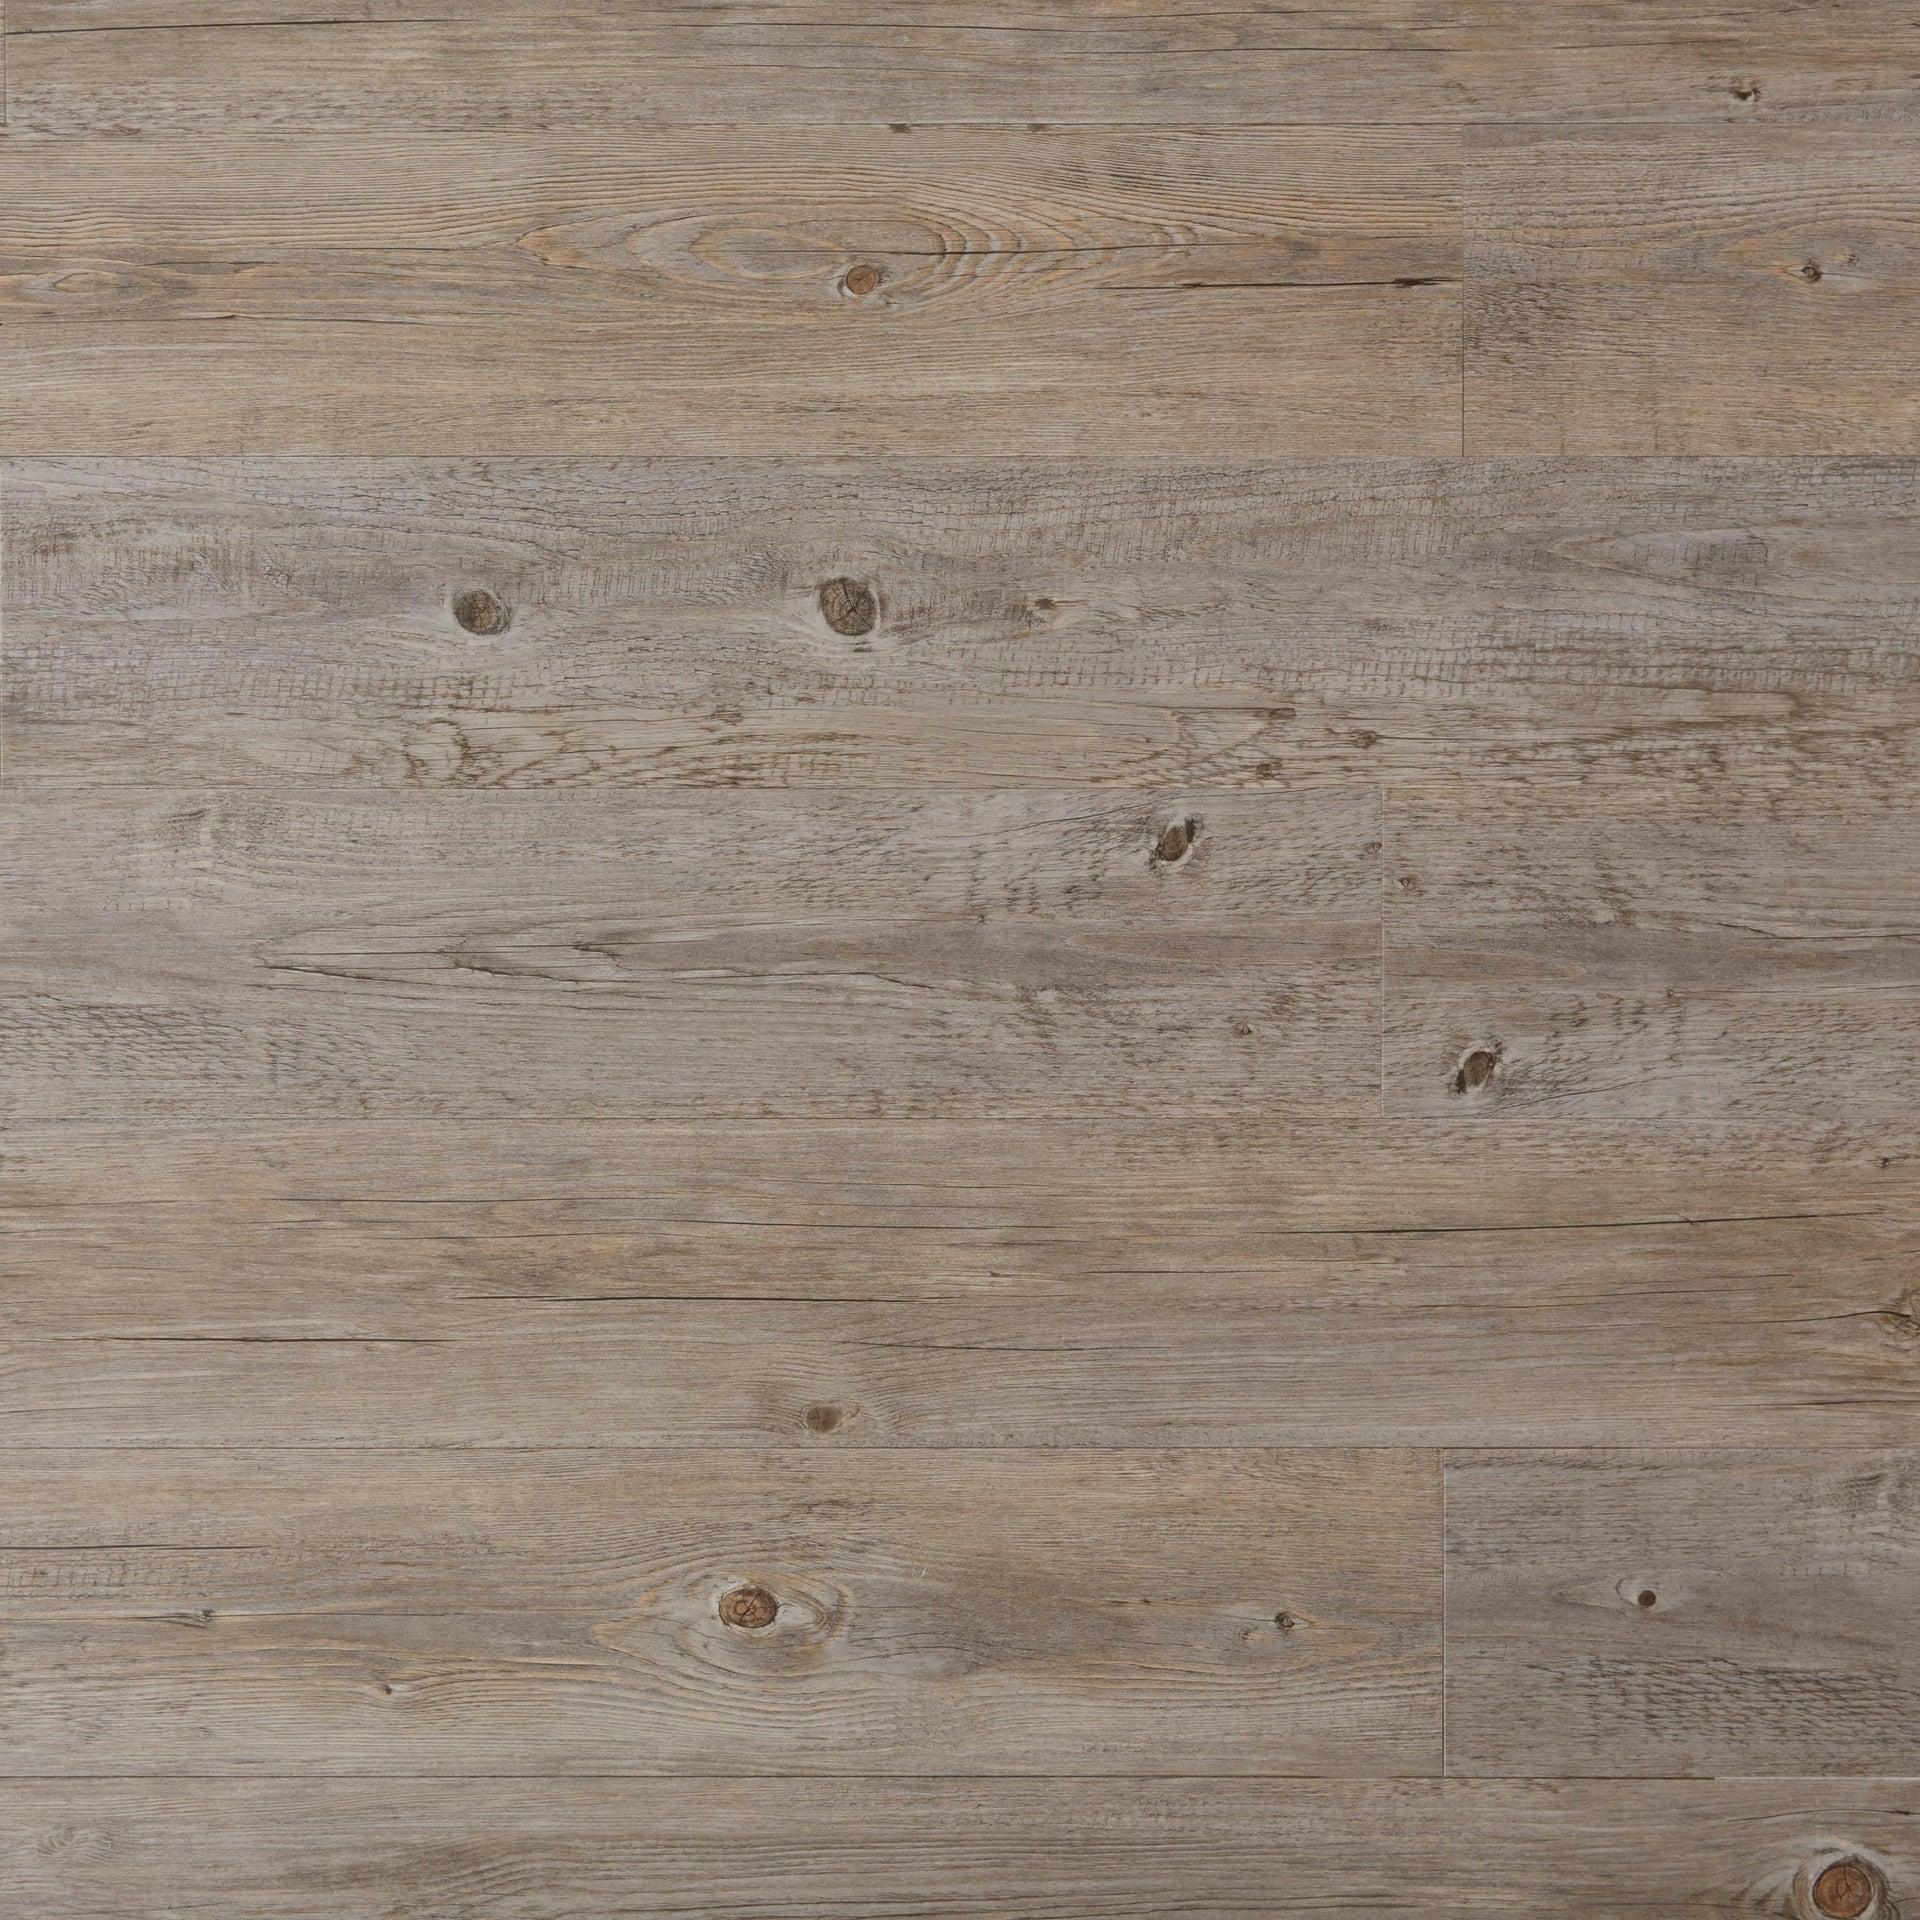 Pavimento PVC adesivo Pecan Sp 2 mm grigio / argento - 3